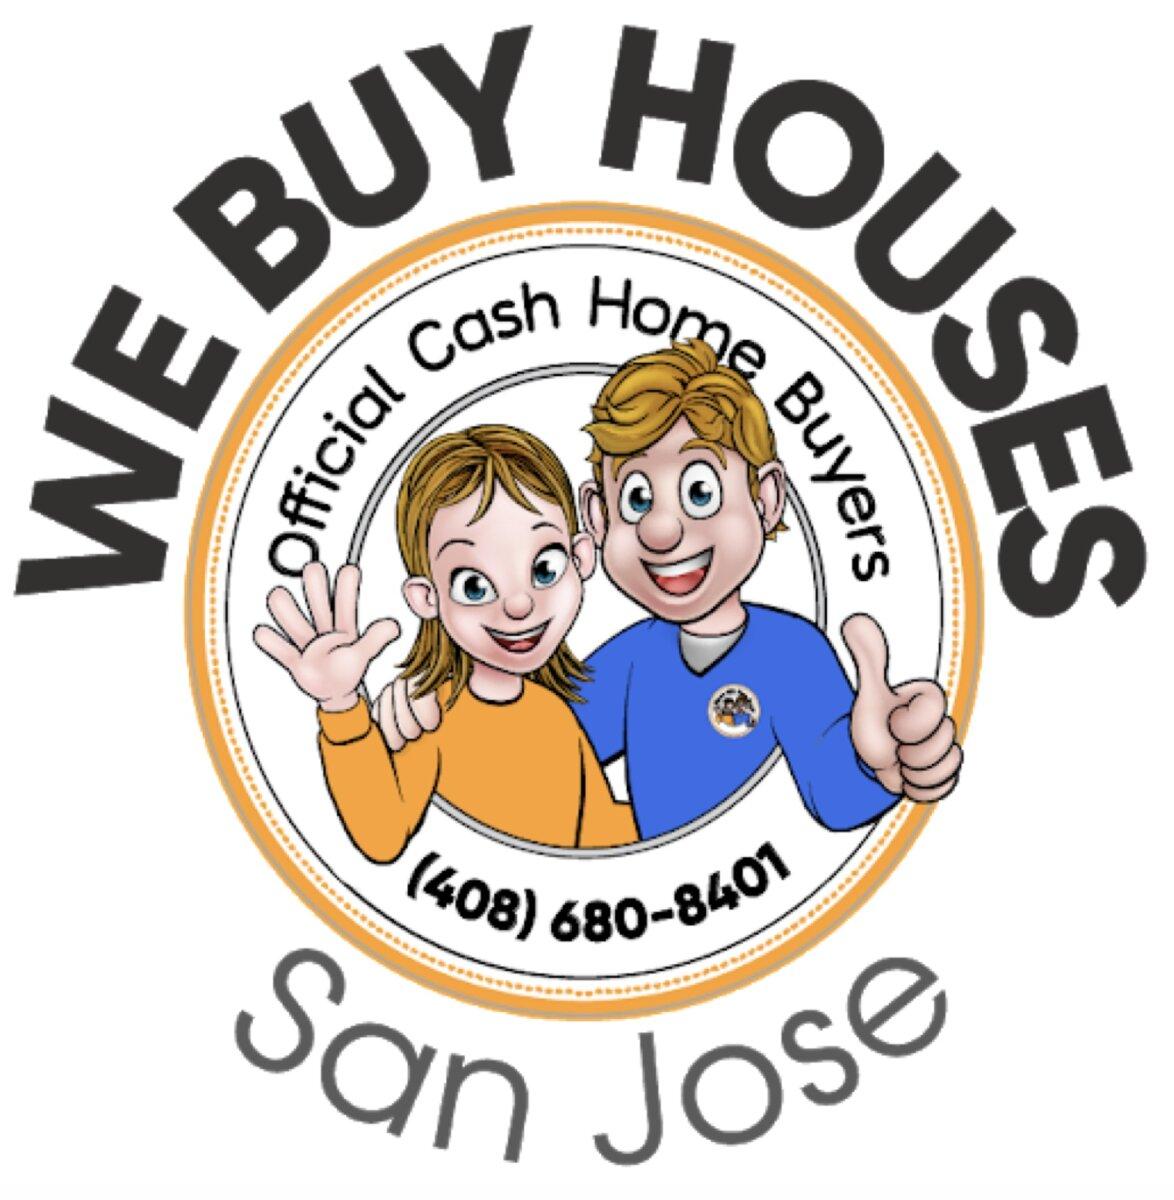 We Buy Houses San Jose, CA logo